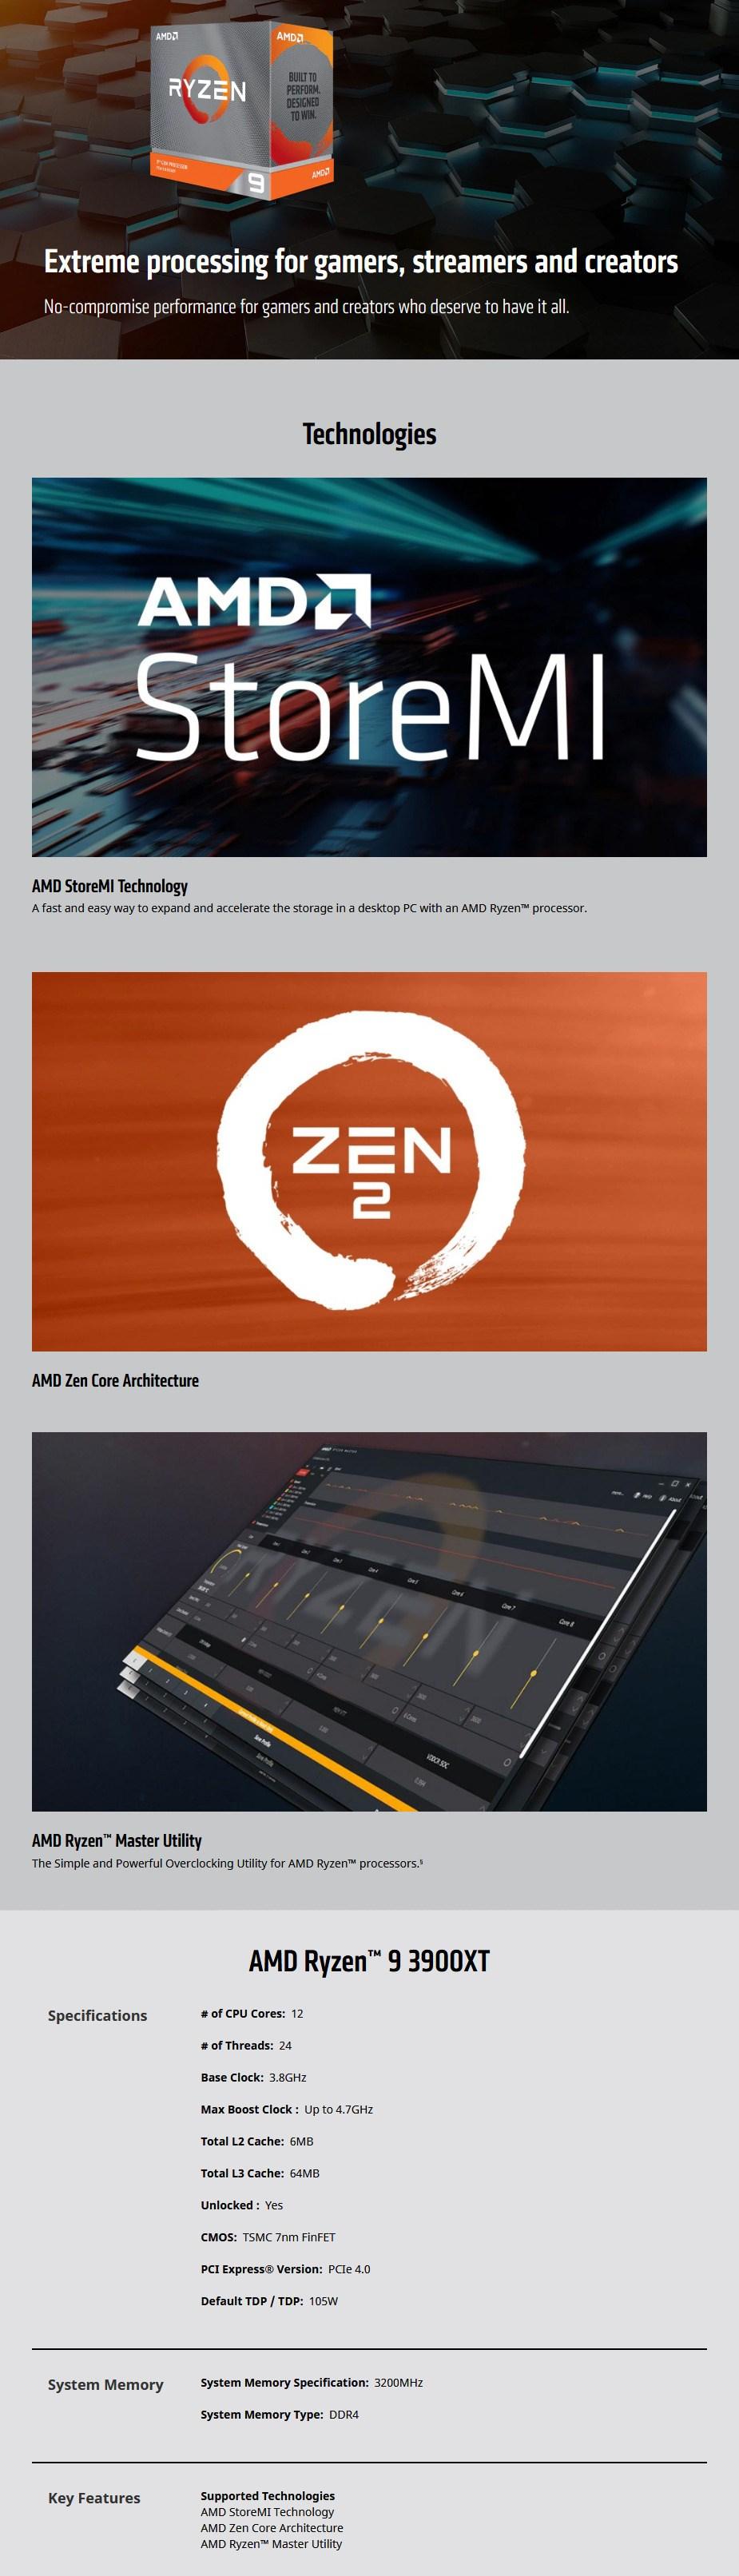 amd-ryzen-9-3900xt-12-core-socket-am4-380ghz-unlocked-cpu-processor-ac35860-1.jpg